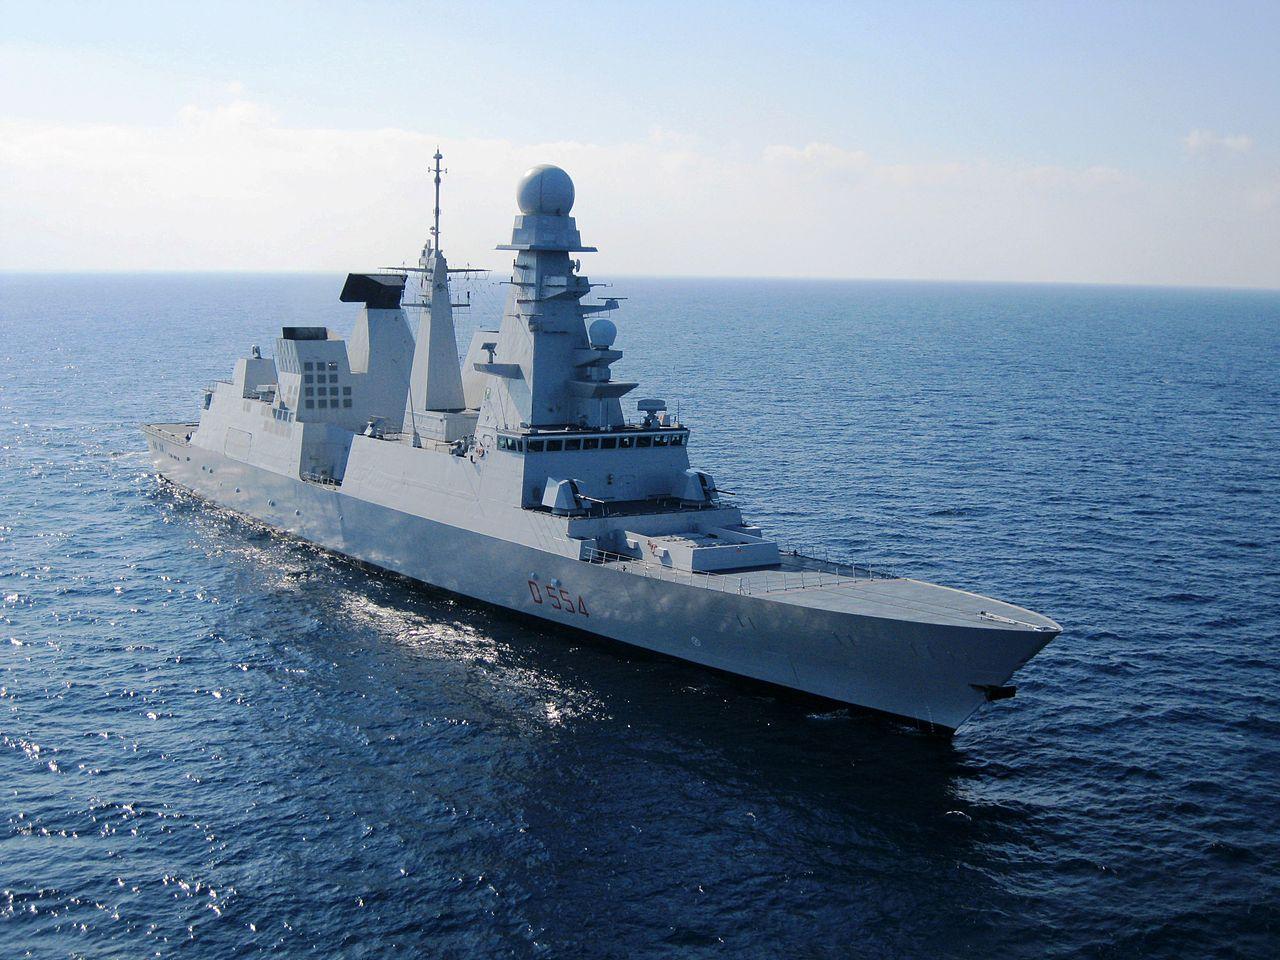 Italian warship Caio Duilio in 2011